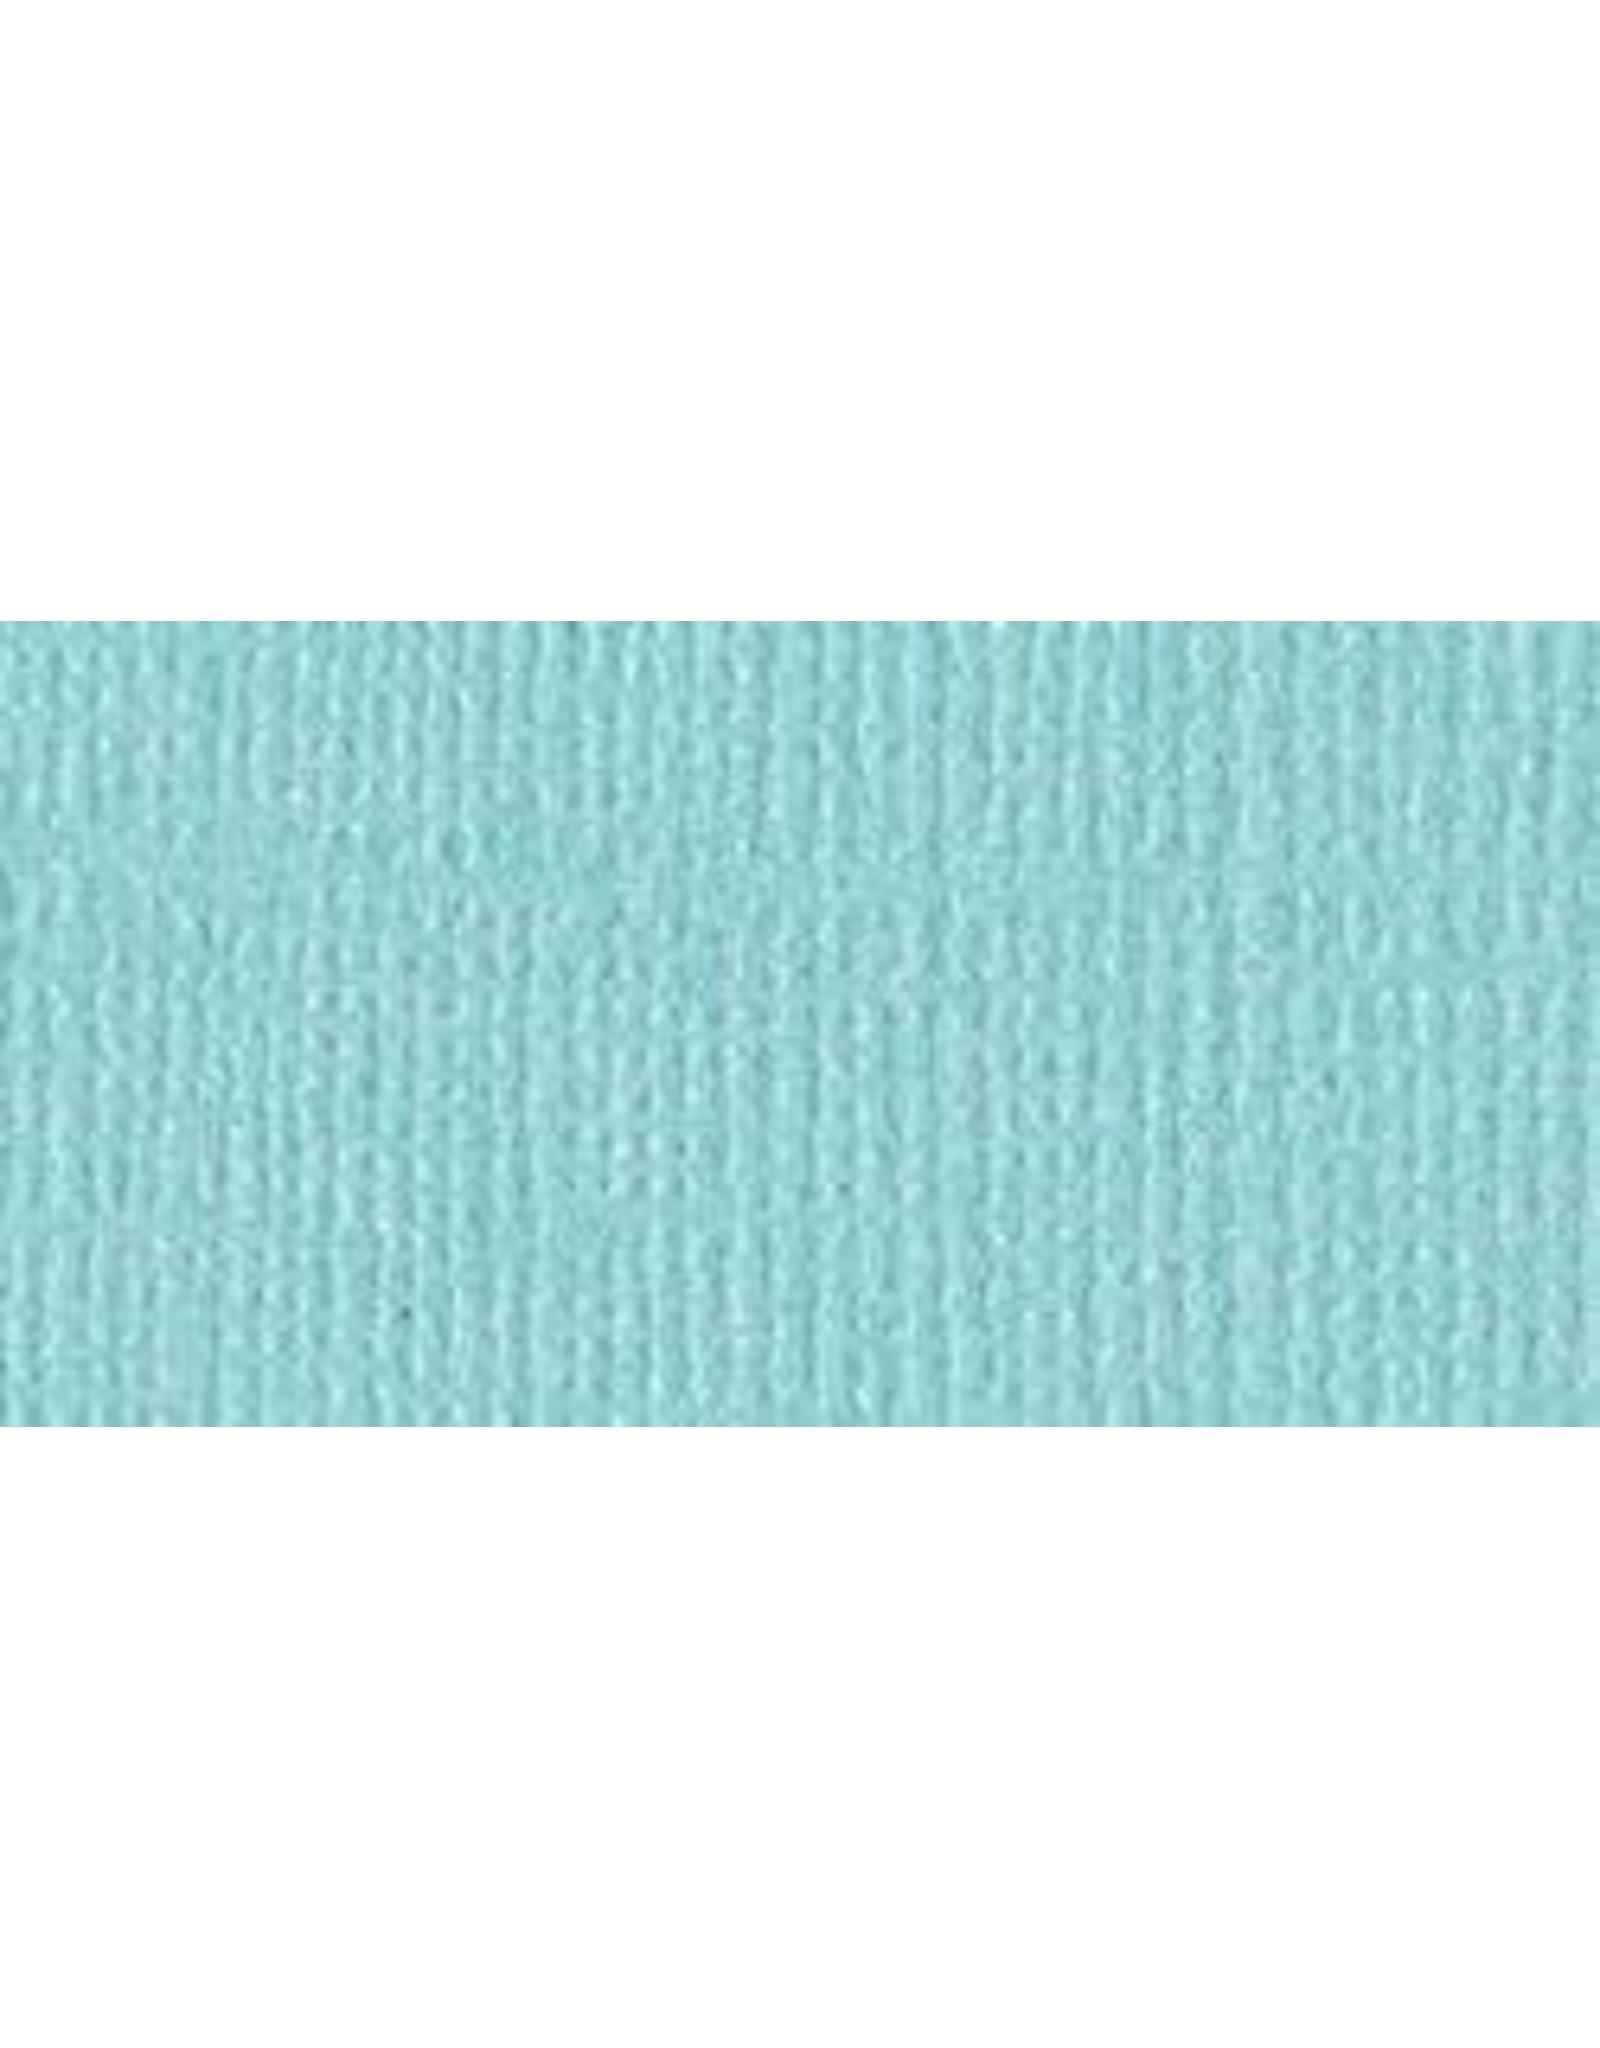 Bazzill Bazzill Bling Cardstock-Shimmer